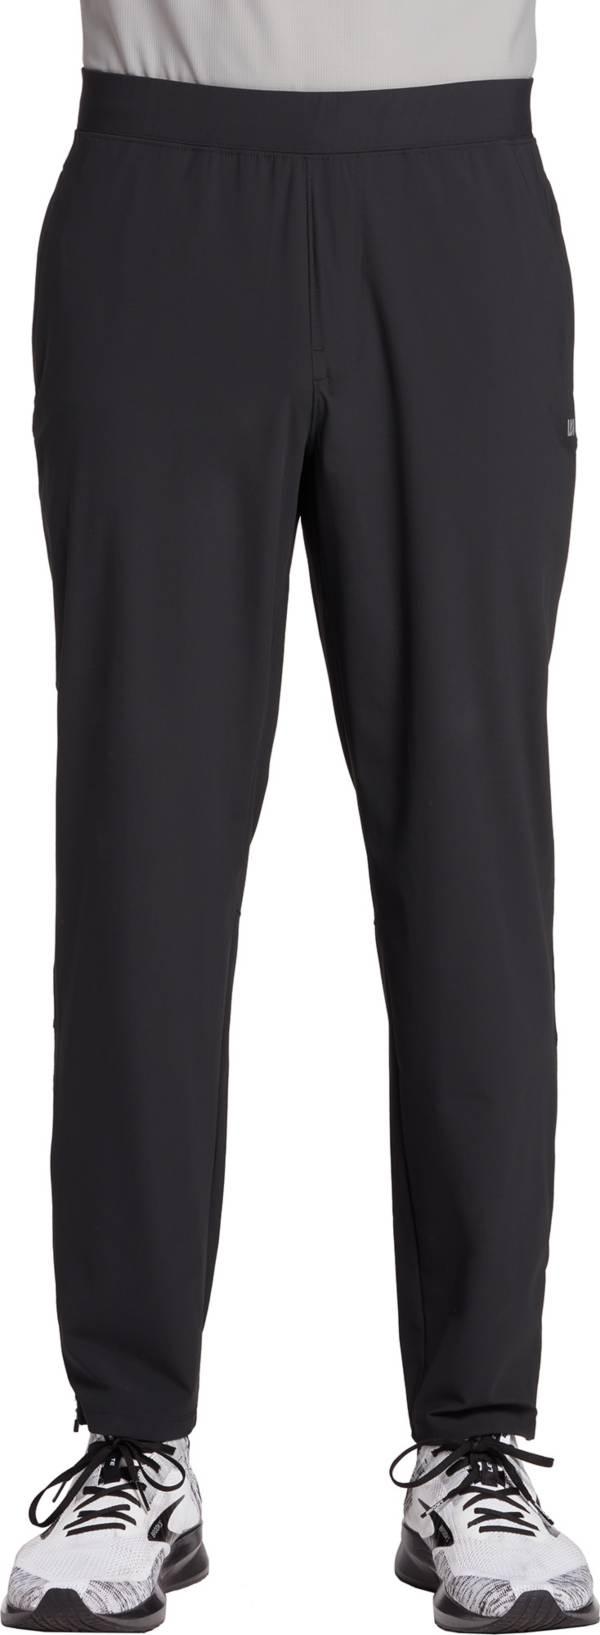 VRST Men's Knit Tapered Run Pants product image